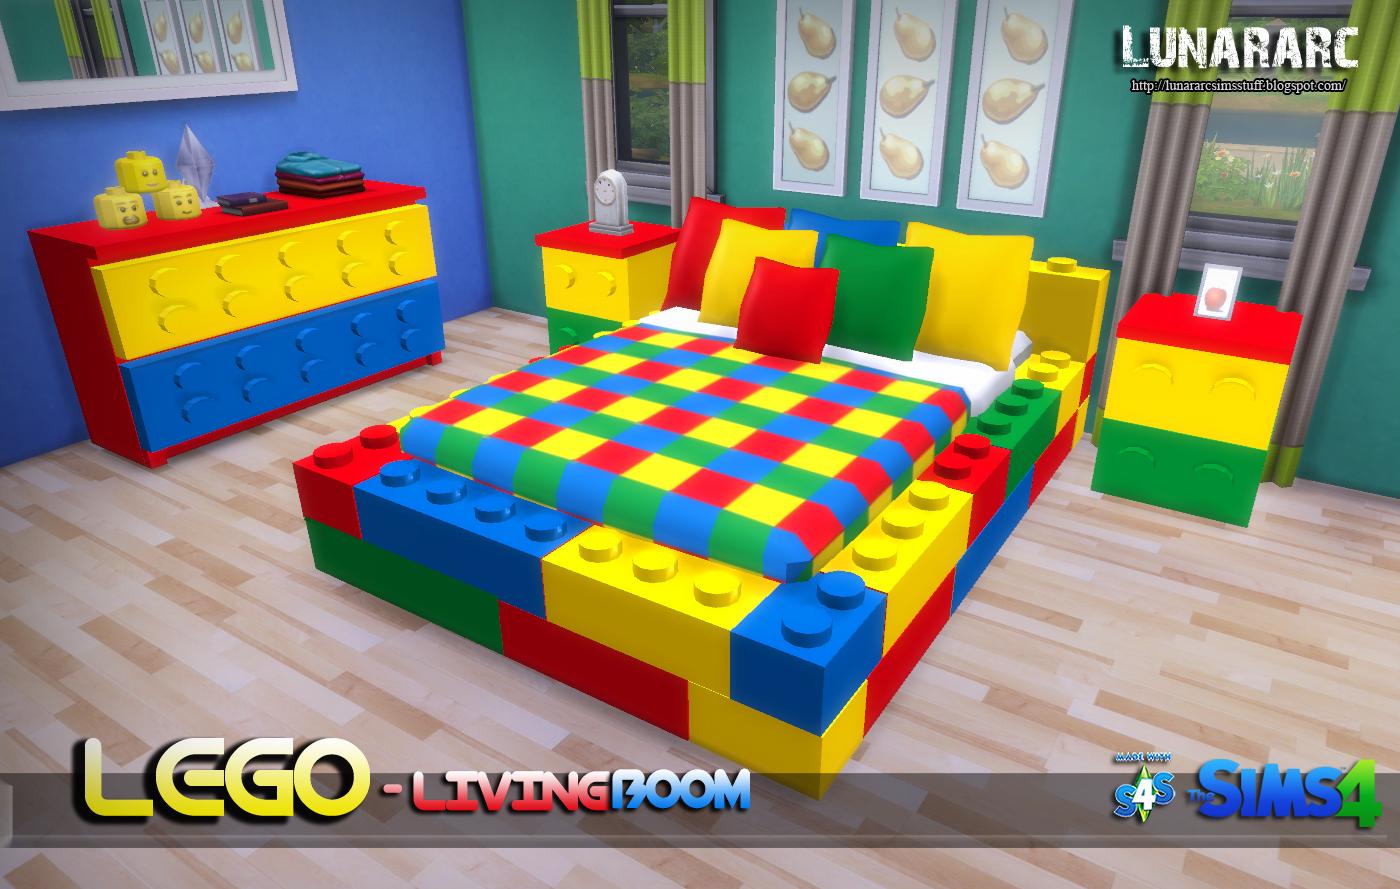 Lego Bedroom Accessories Lunararc Sims Lego Bedroom Set